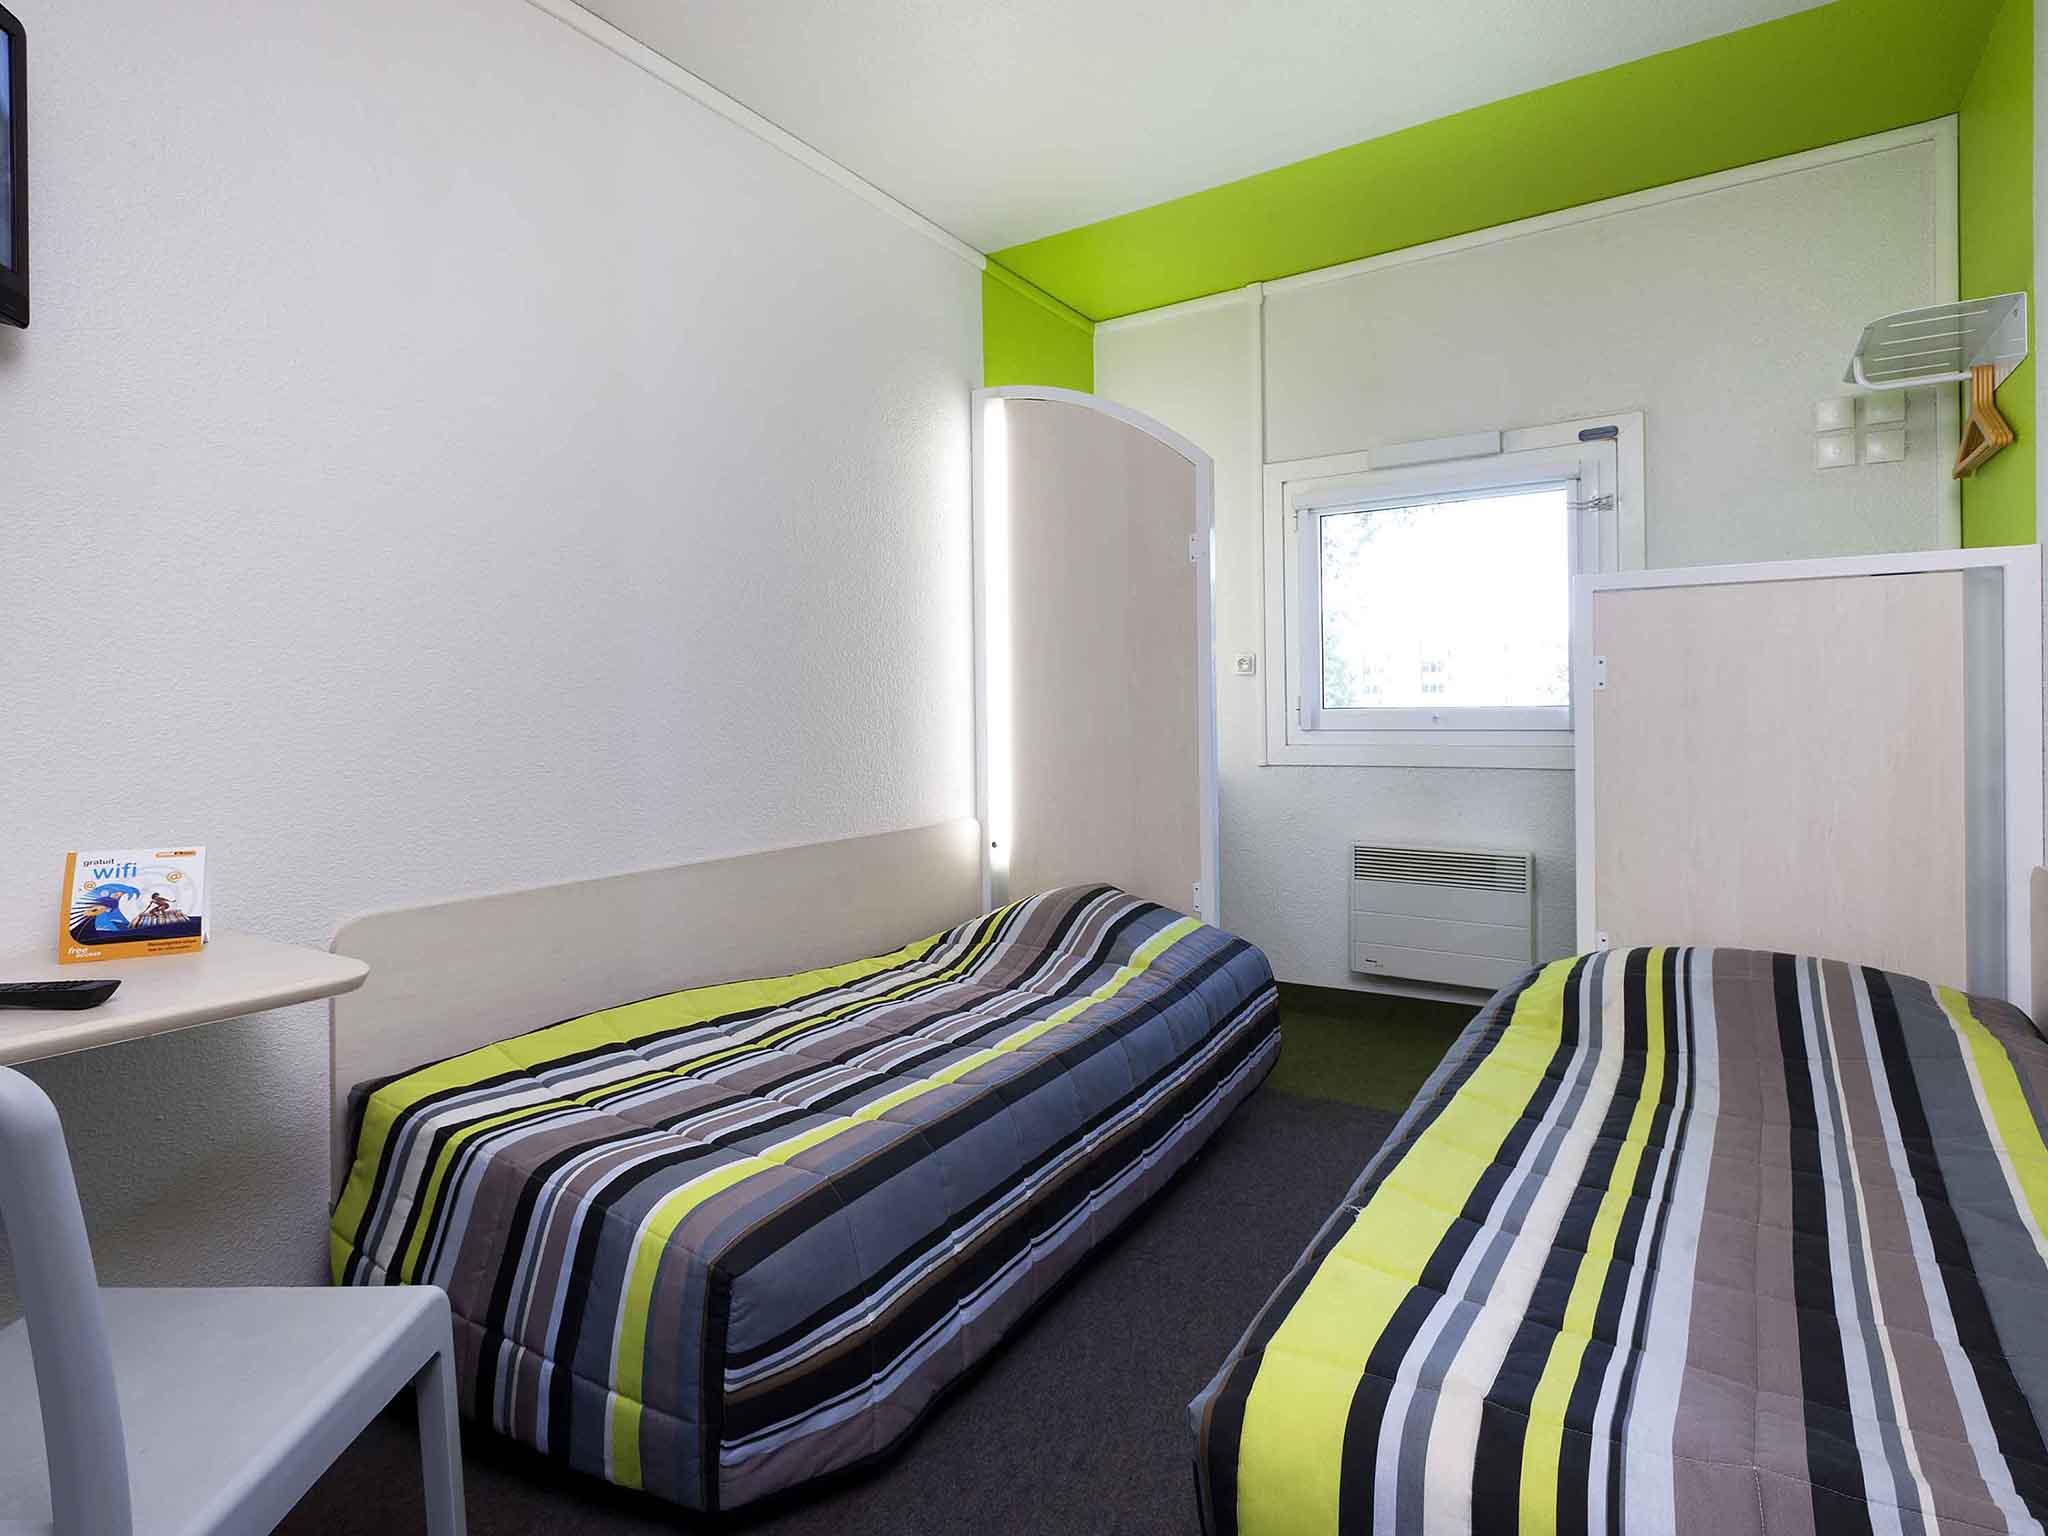 h tel tilloy les mofflaines hotelf1 arras lens bus direct gare d 39 arras. Black Bedroom Furniture Sets. Home Design Ideas